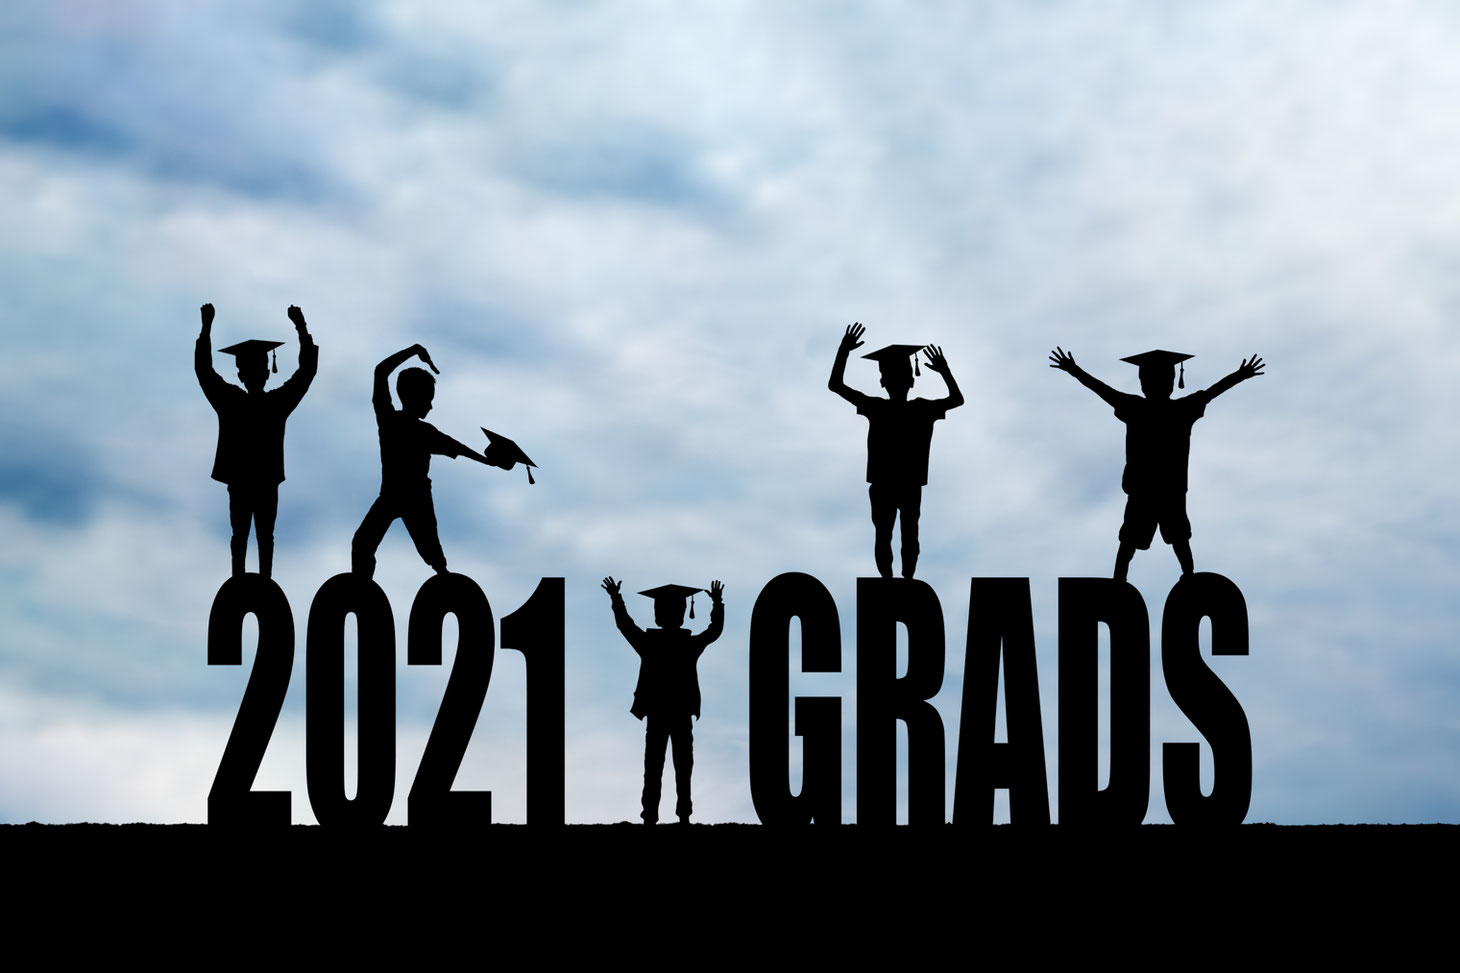 5 boys in silhouette wearing grad caps on block letters reading 2021 grads. The sky is blue